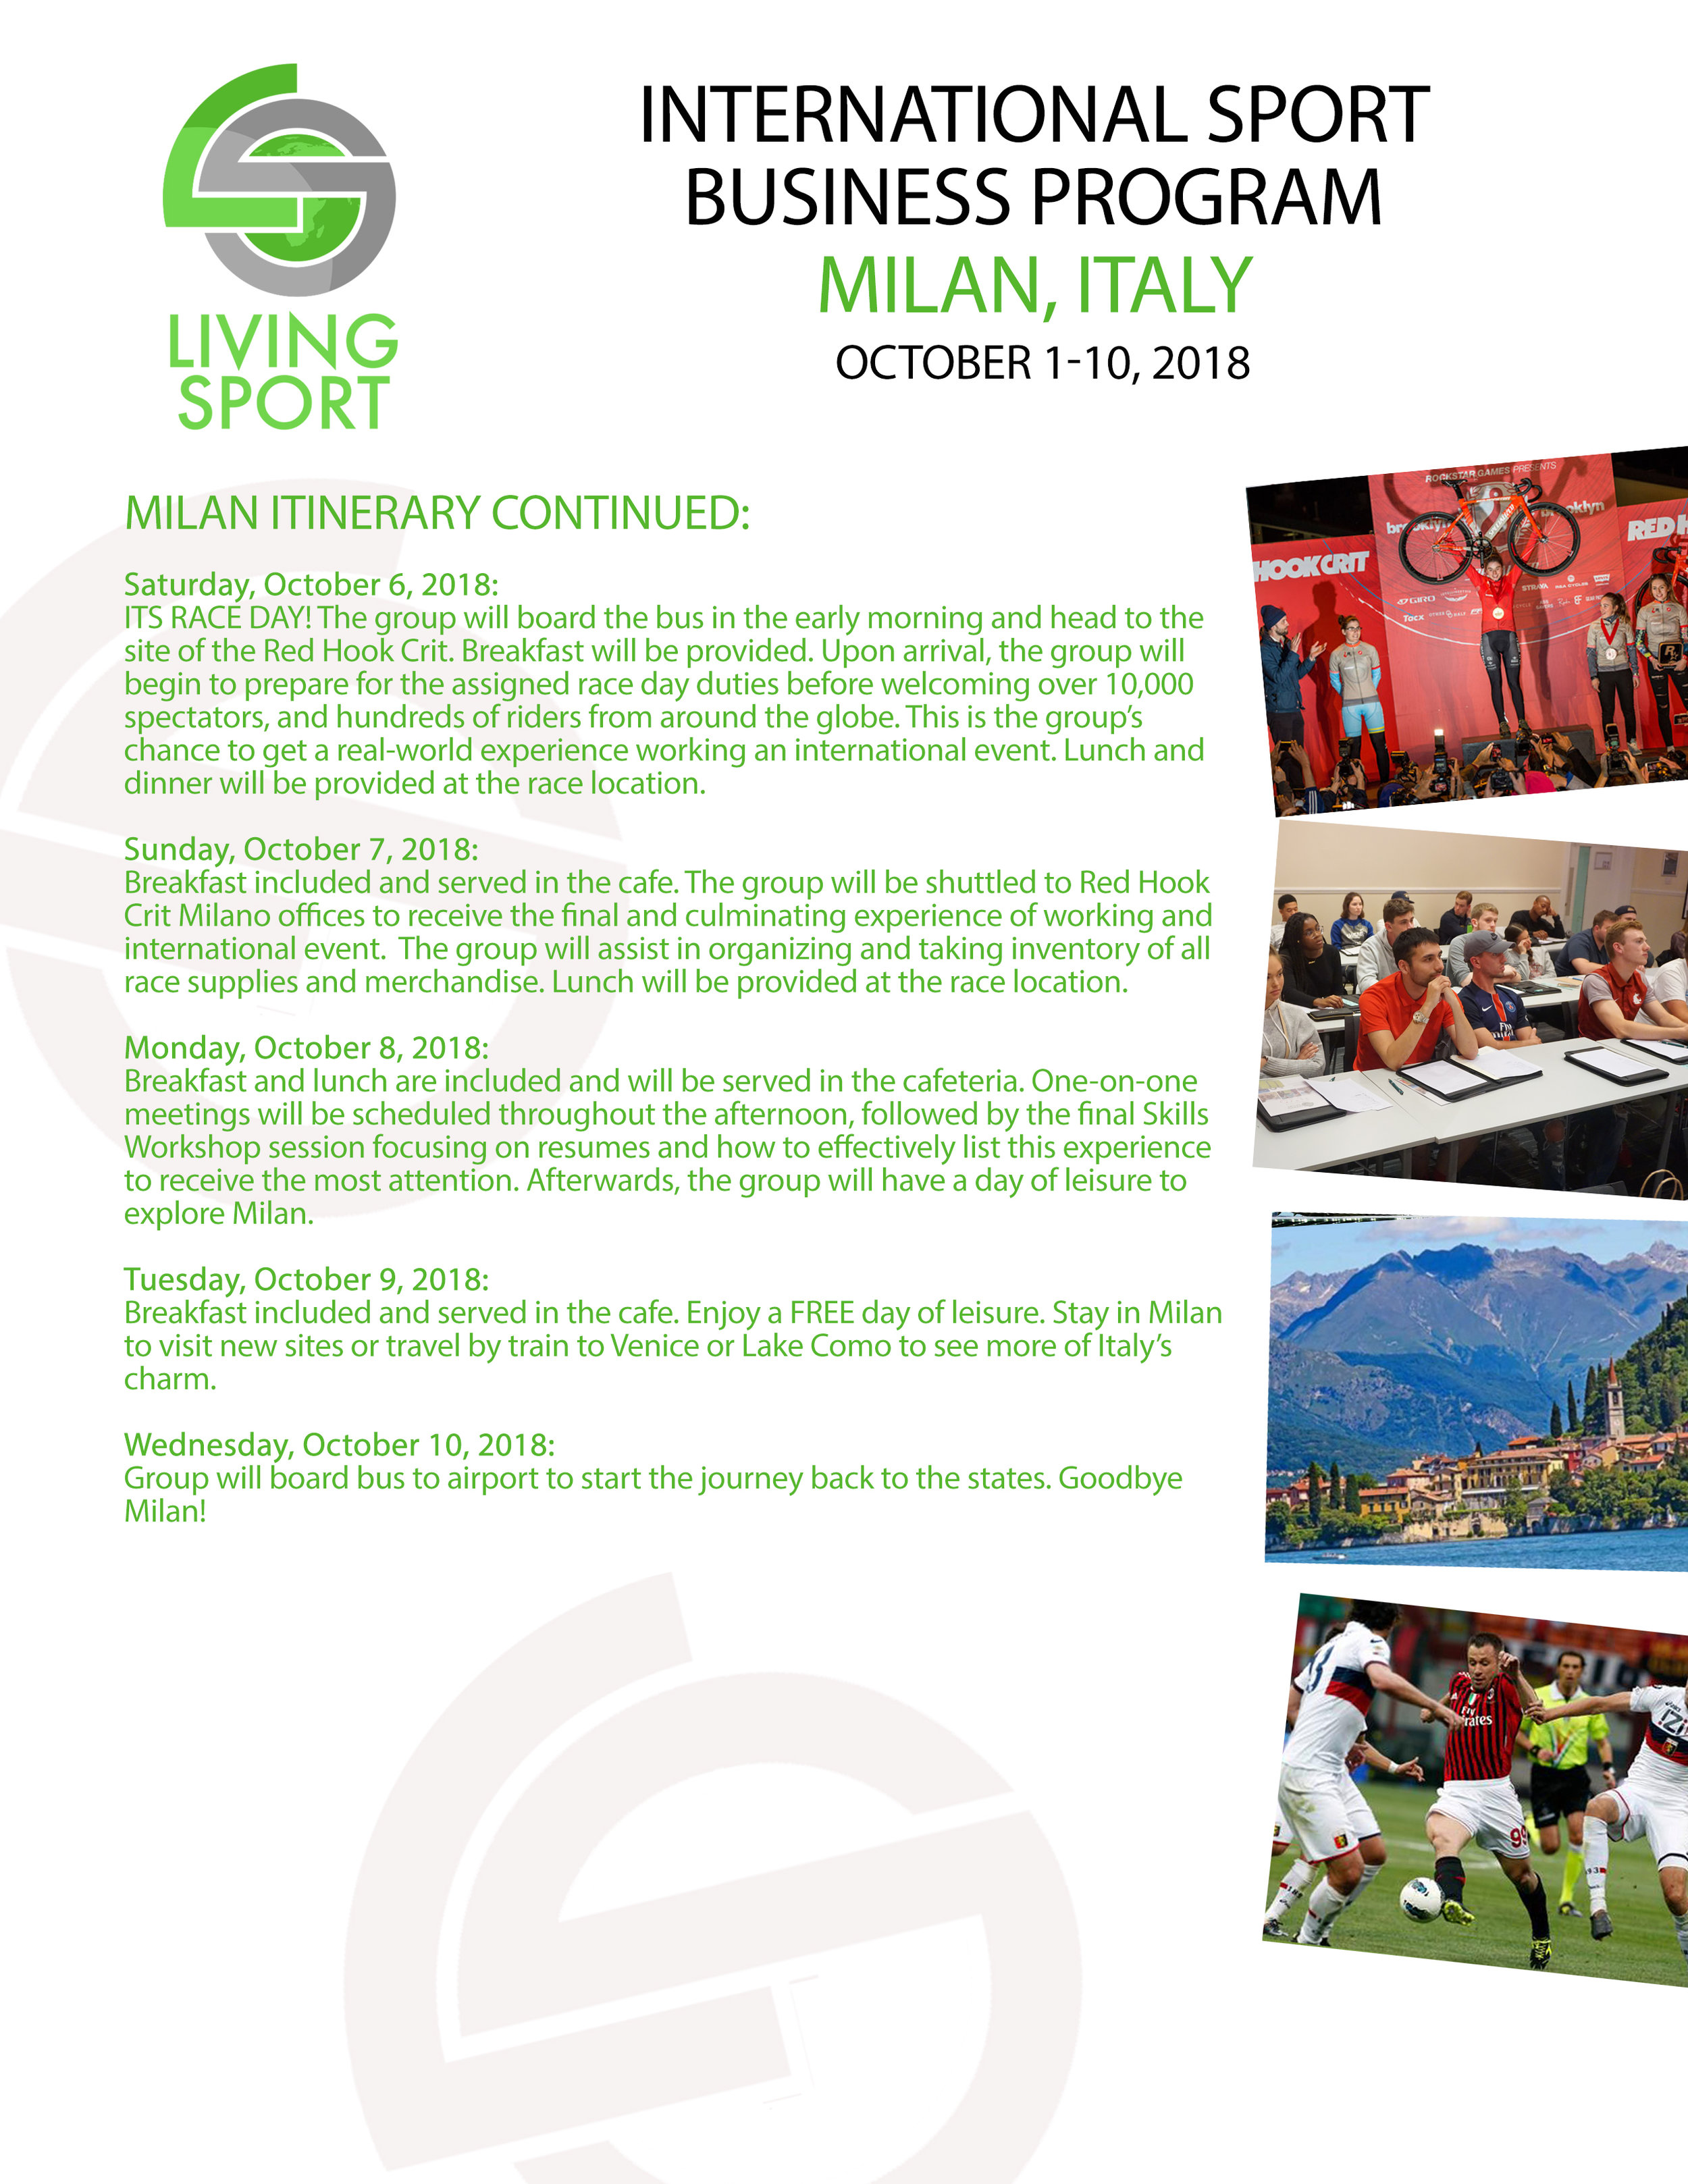 Living Sport- Milan Itinerary p2 2018.jpg